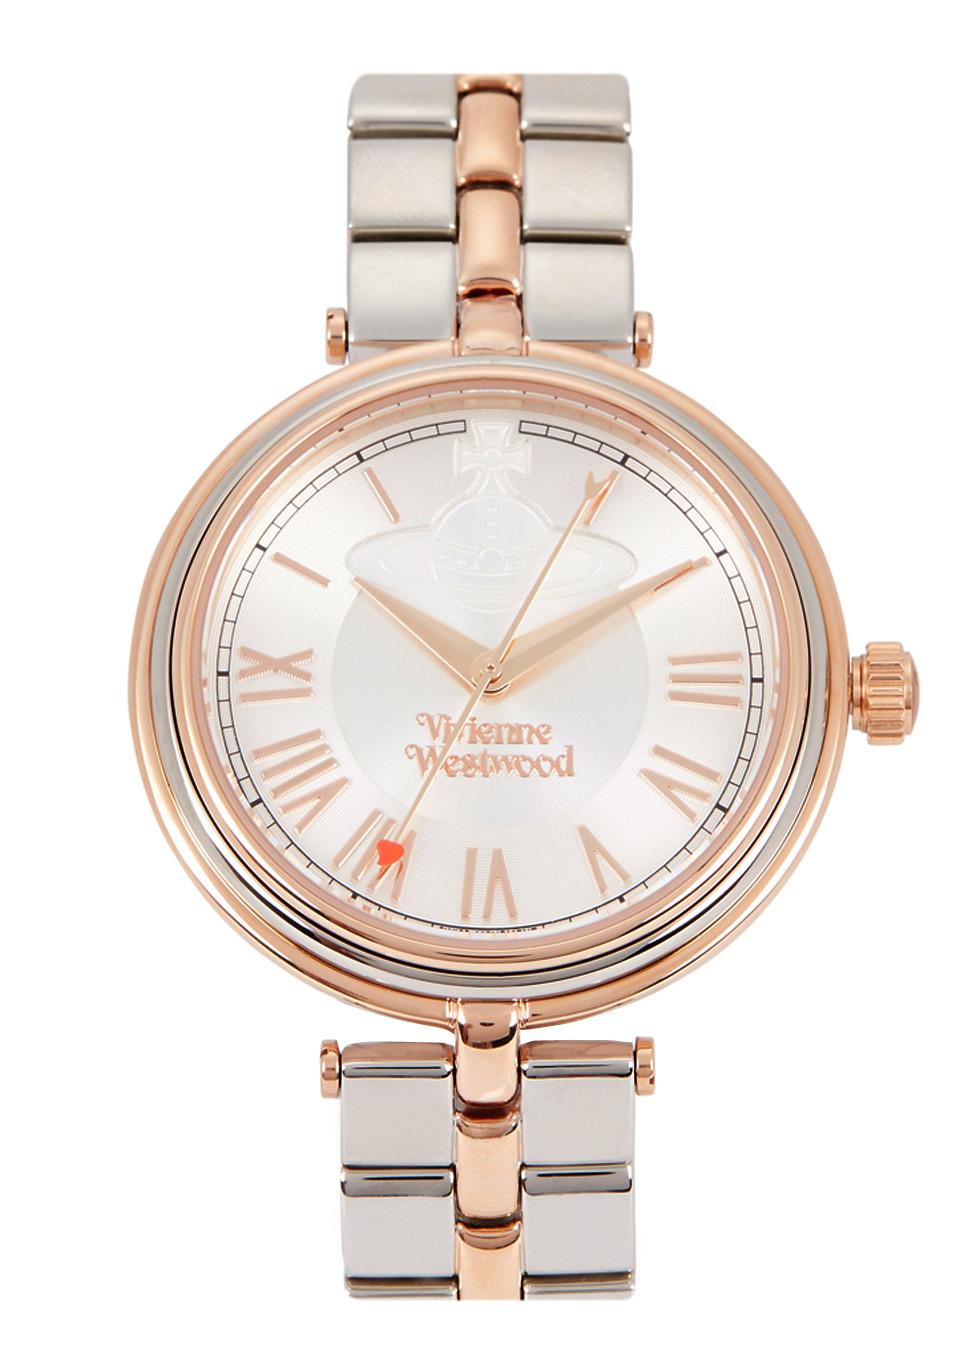 Farringdon two-tone watch - Vivienne Westwood